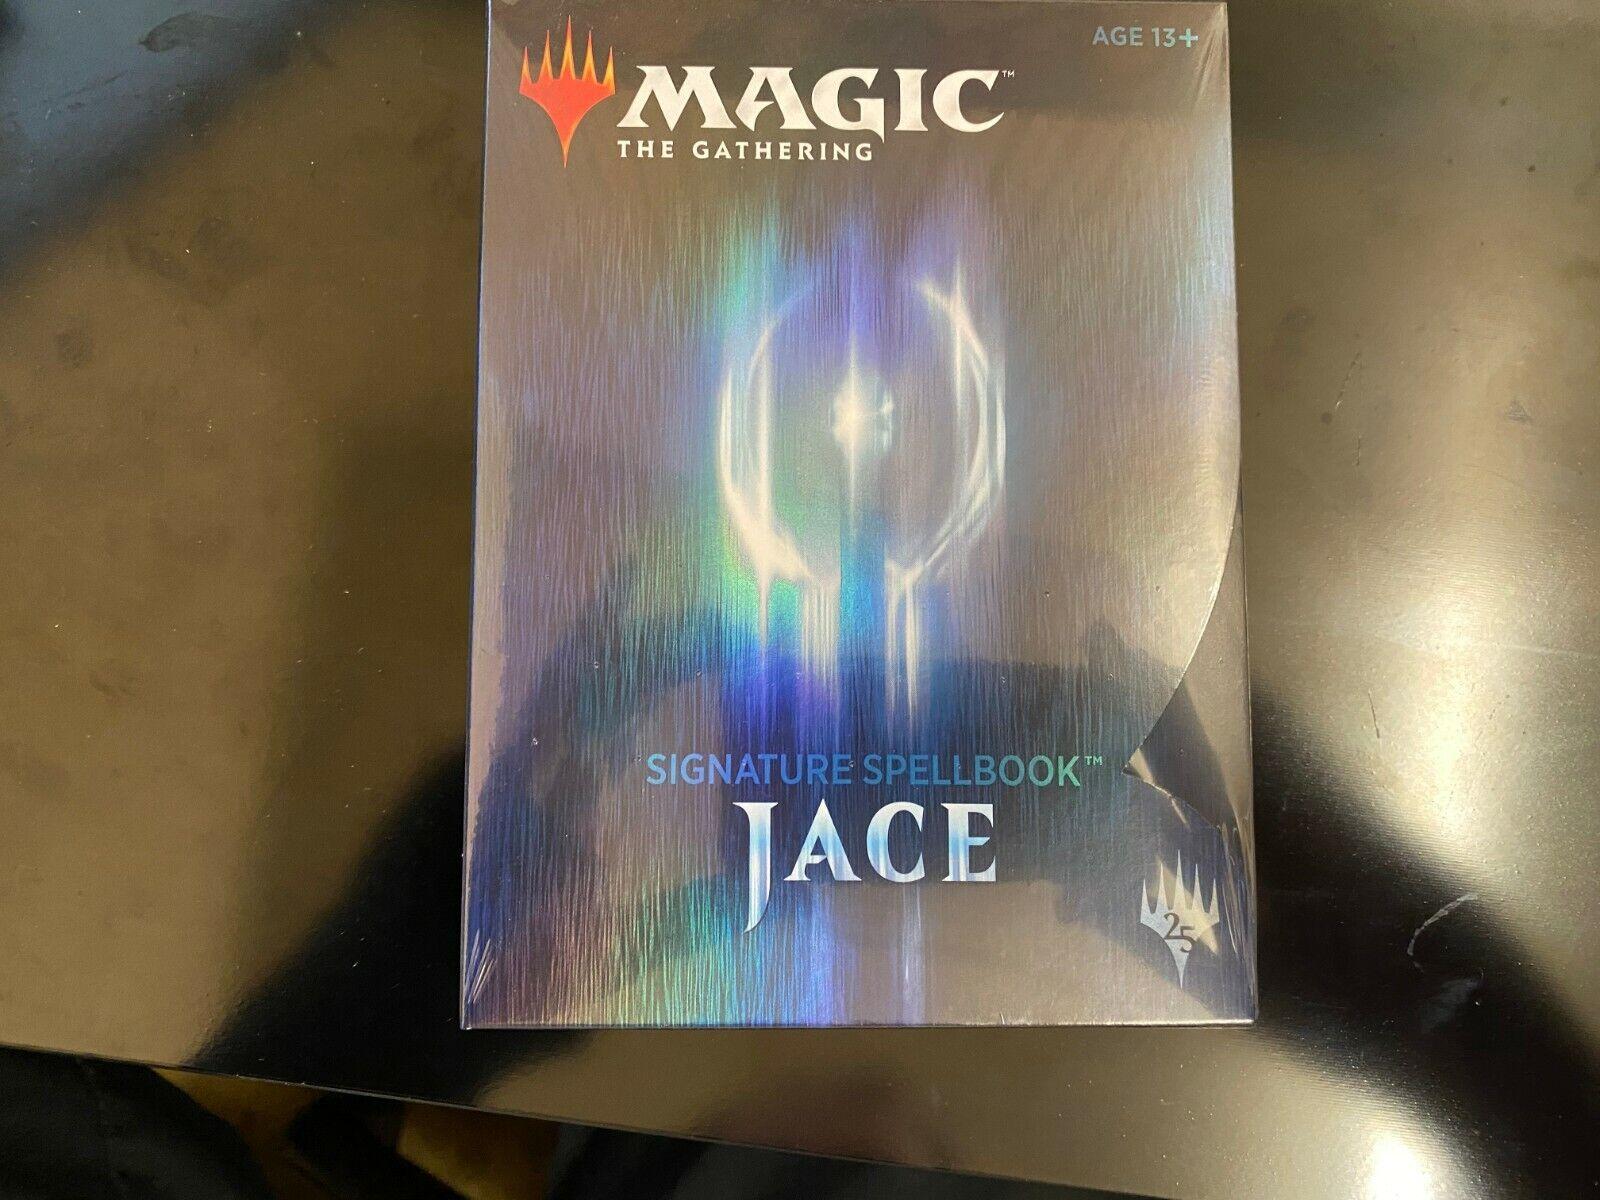 Factory Sealed removed box MTG Englsih,Signature Spellbook Jace booster